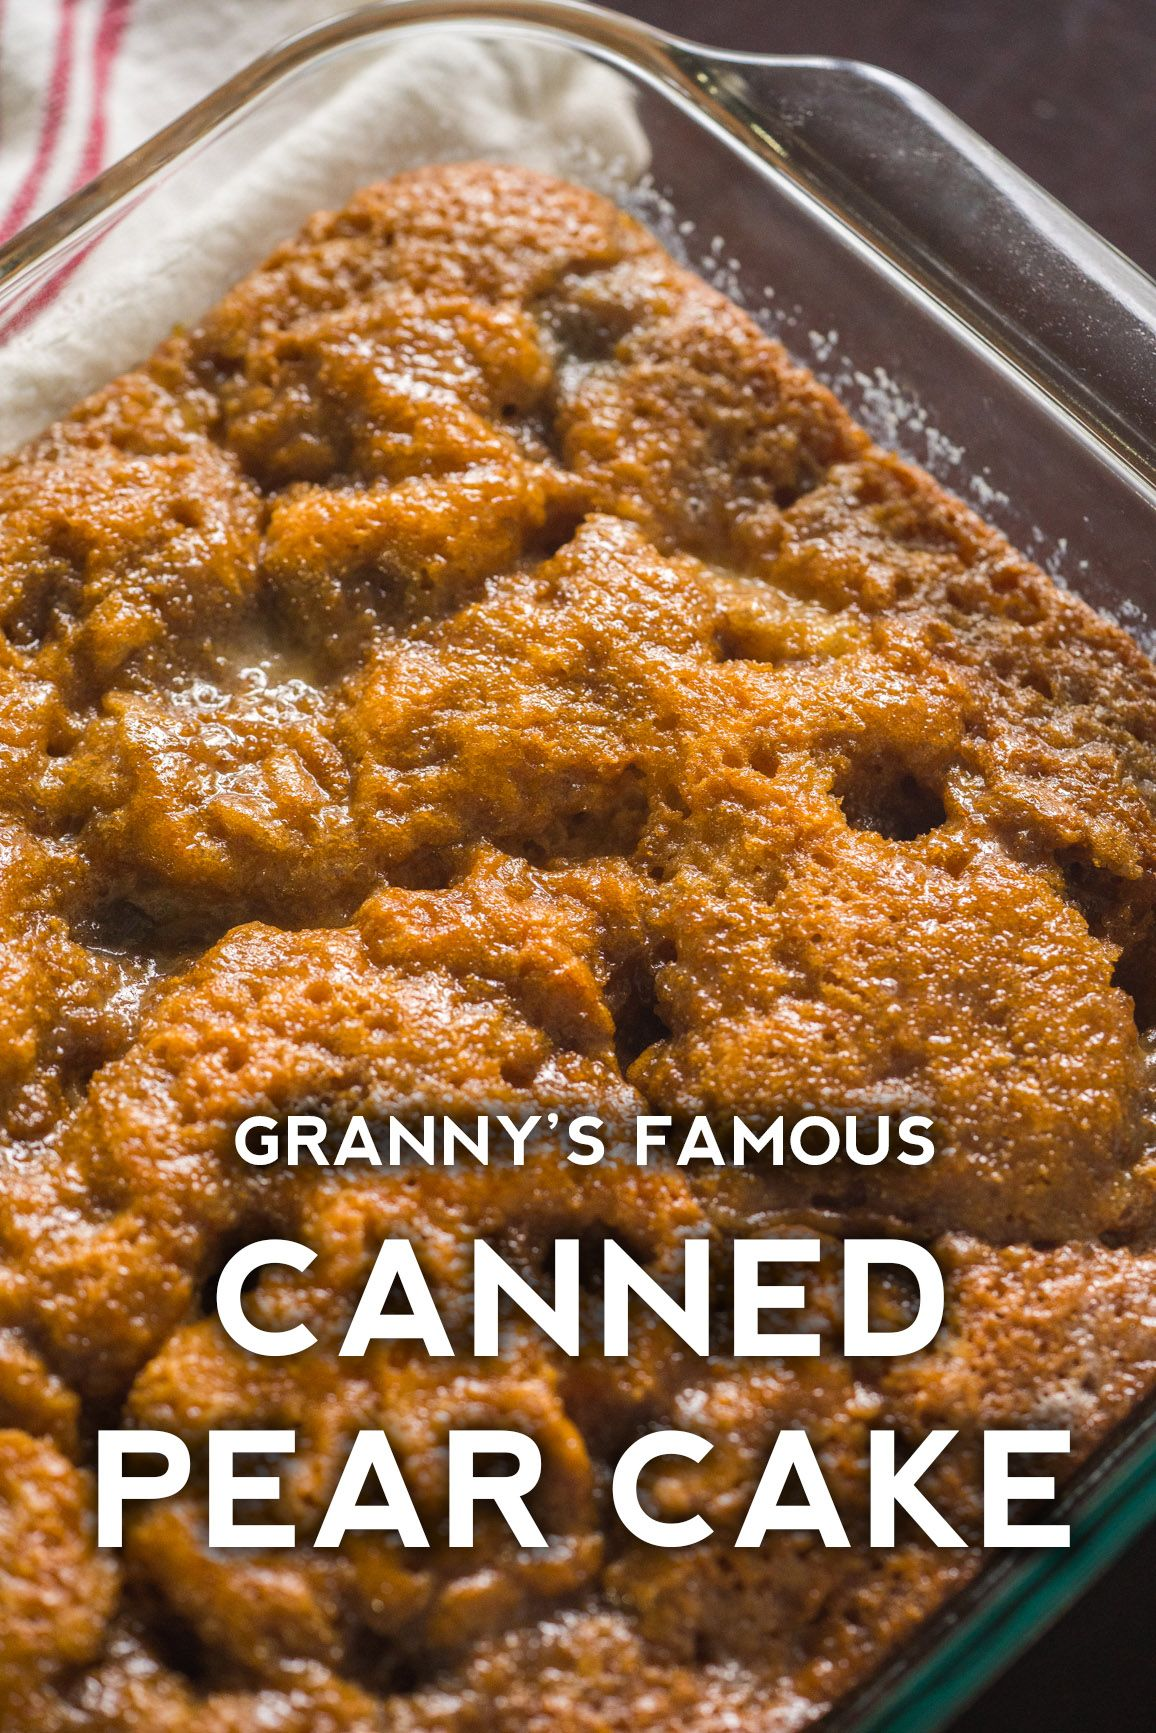 Granny's Pear Cake